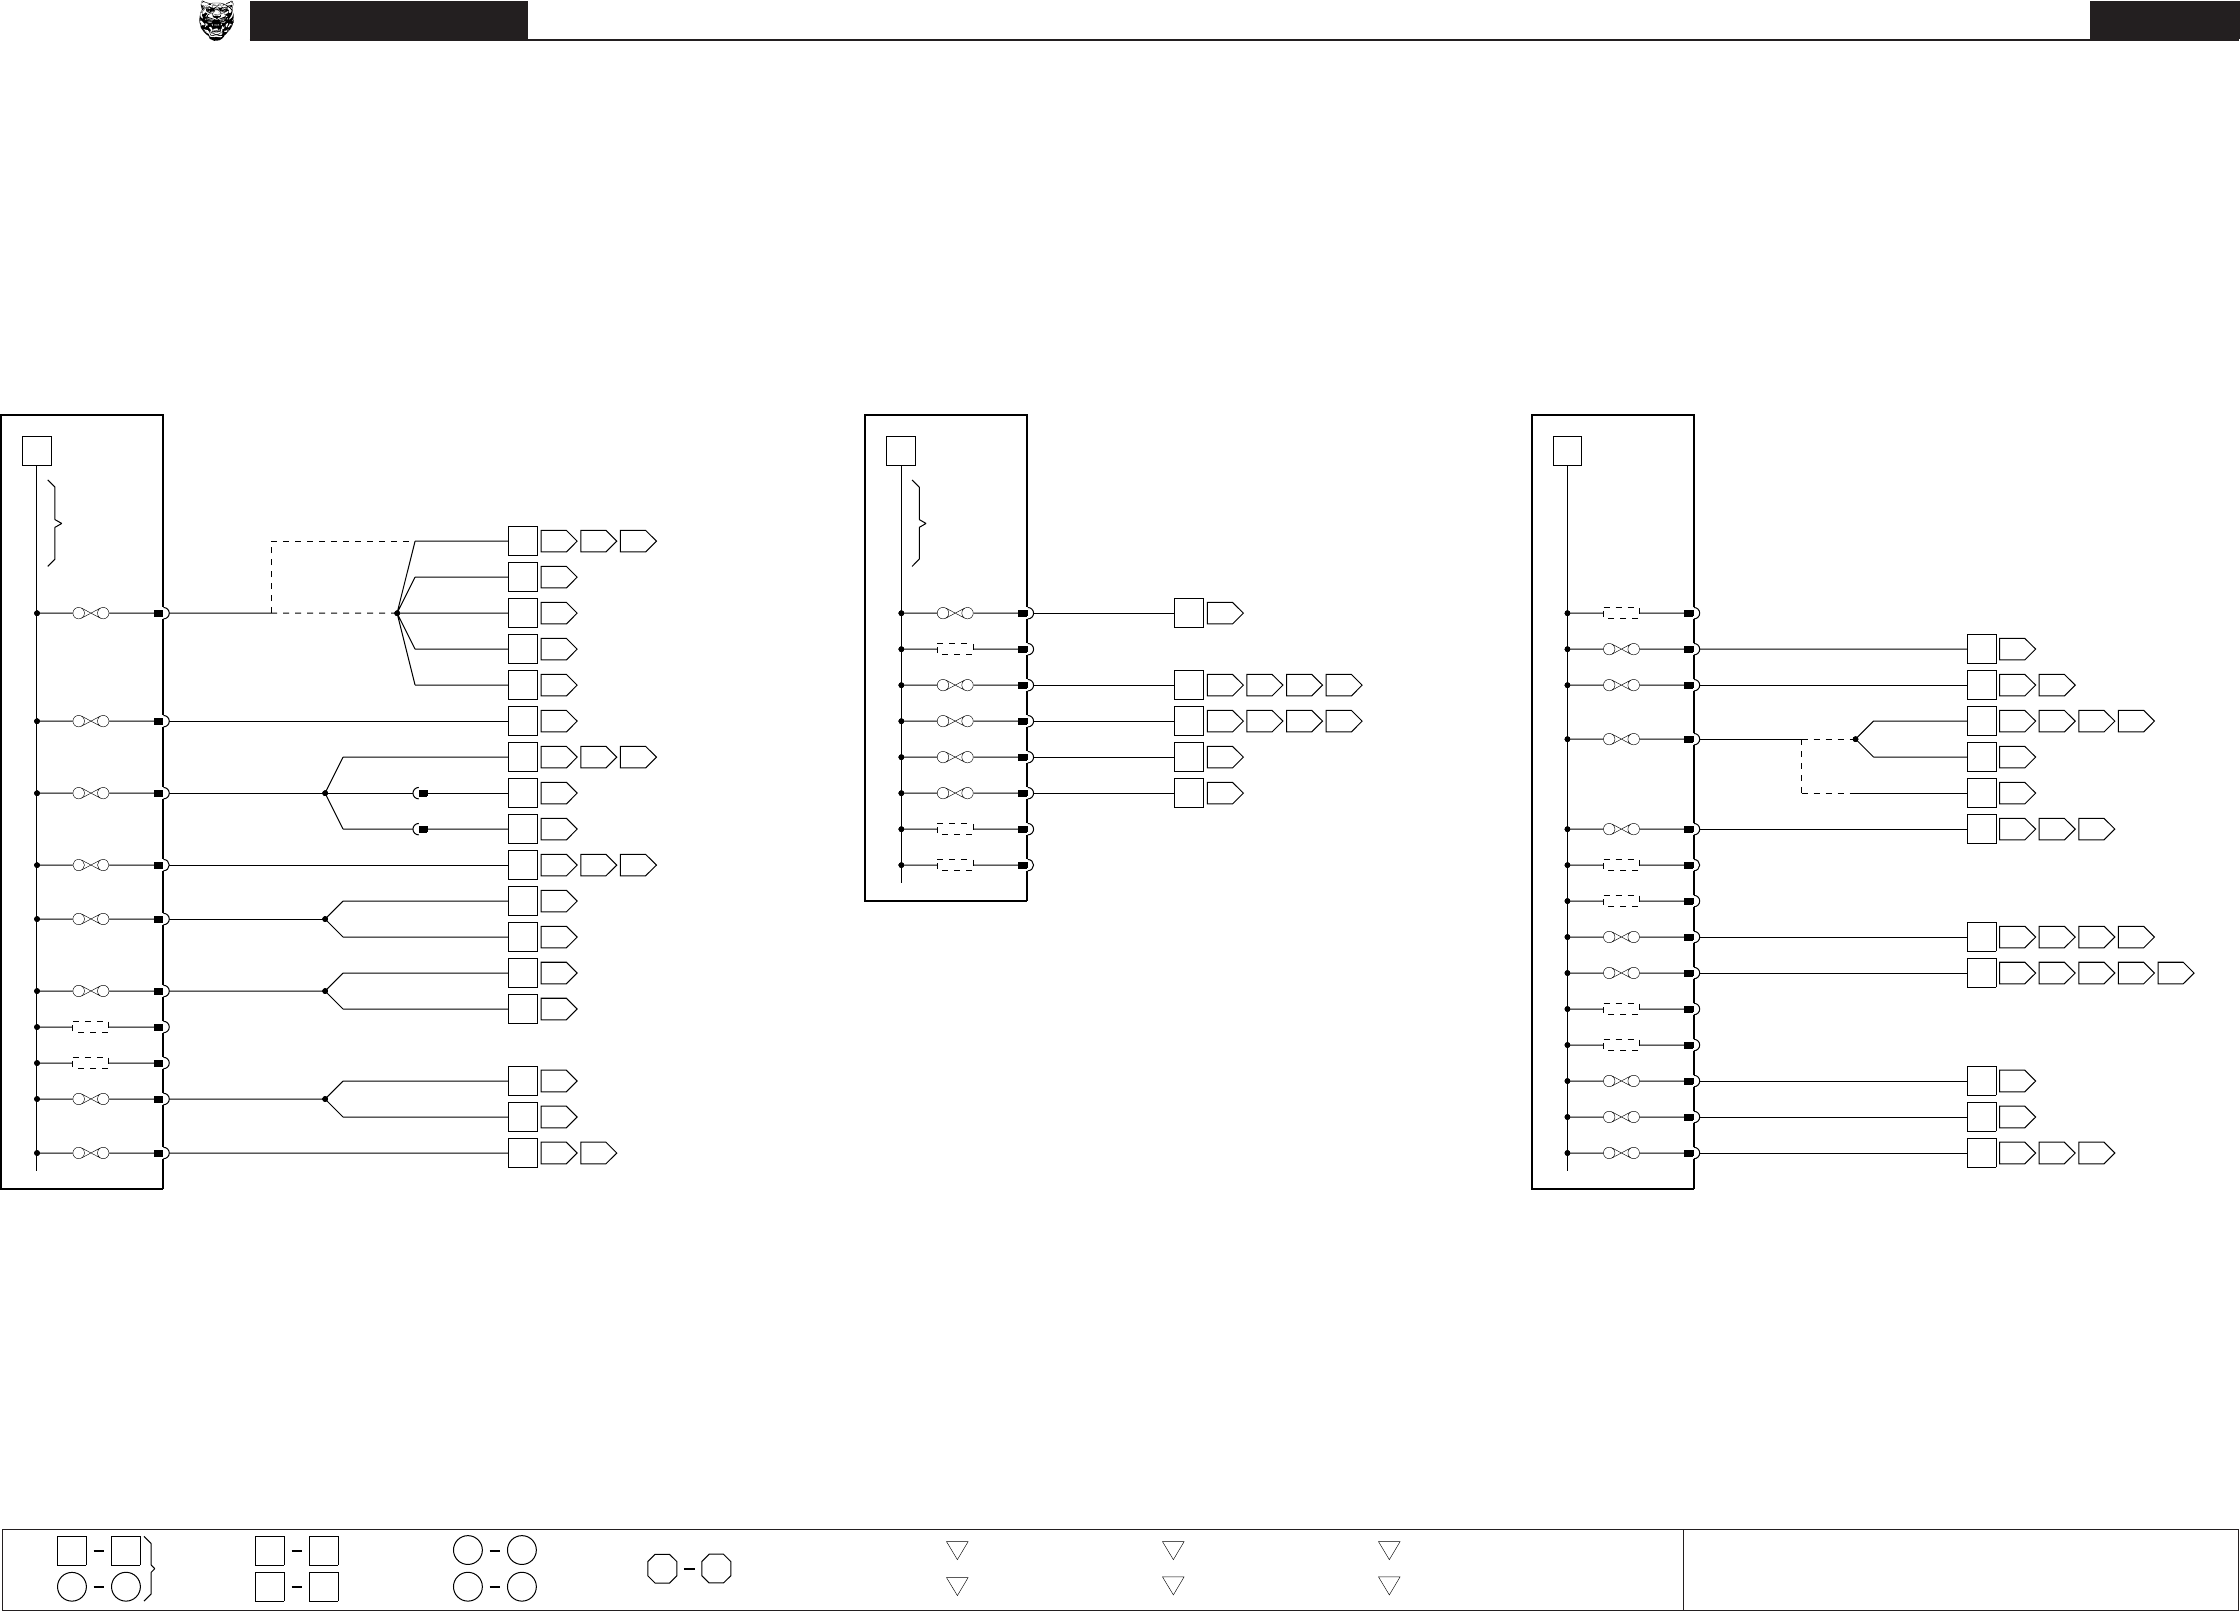 Jaguar Xk8 Users Manual X100 9875/E COVER